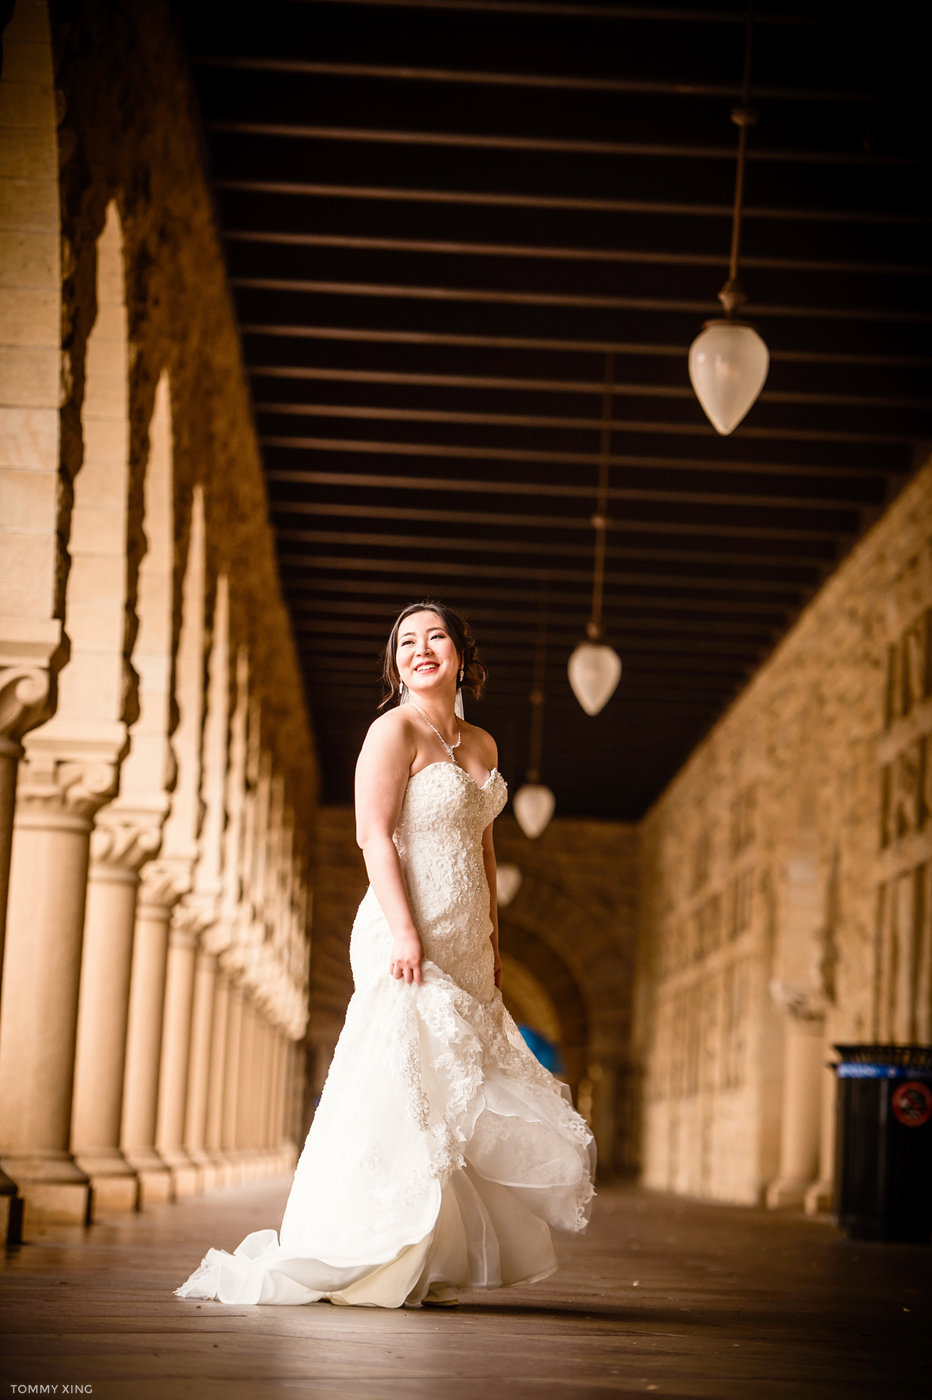 STANFORD MEMORIAL CHURCH WEDDING - Wenjie & Chengcheng - SAN FRANCISCO BAY AREA 斯坦福教堂婚礼跟拍 - 洛杉矶婚礼婚纱照摄影师 Tommy Xing Photography152.jpg